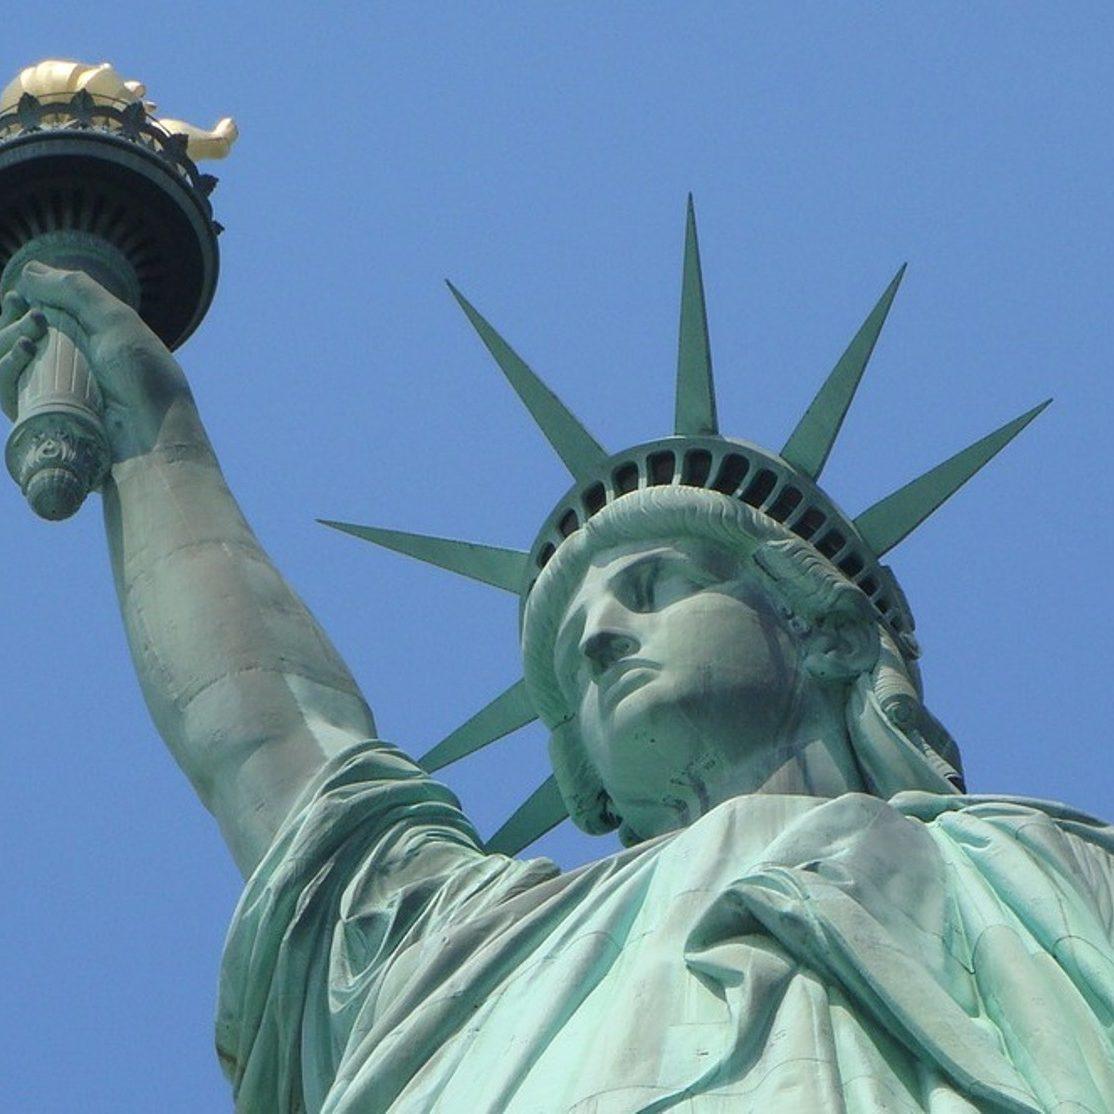 statue-of-liberty-1834573_1280